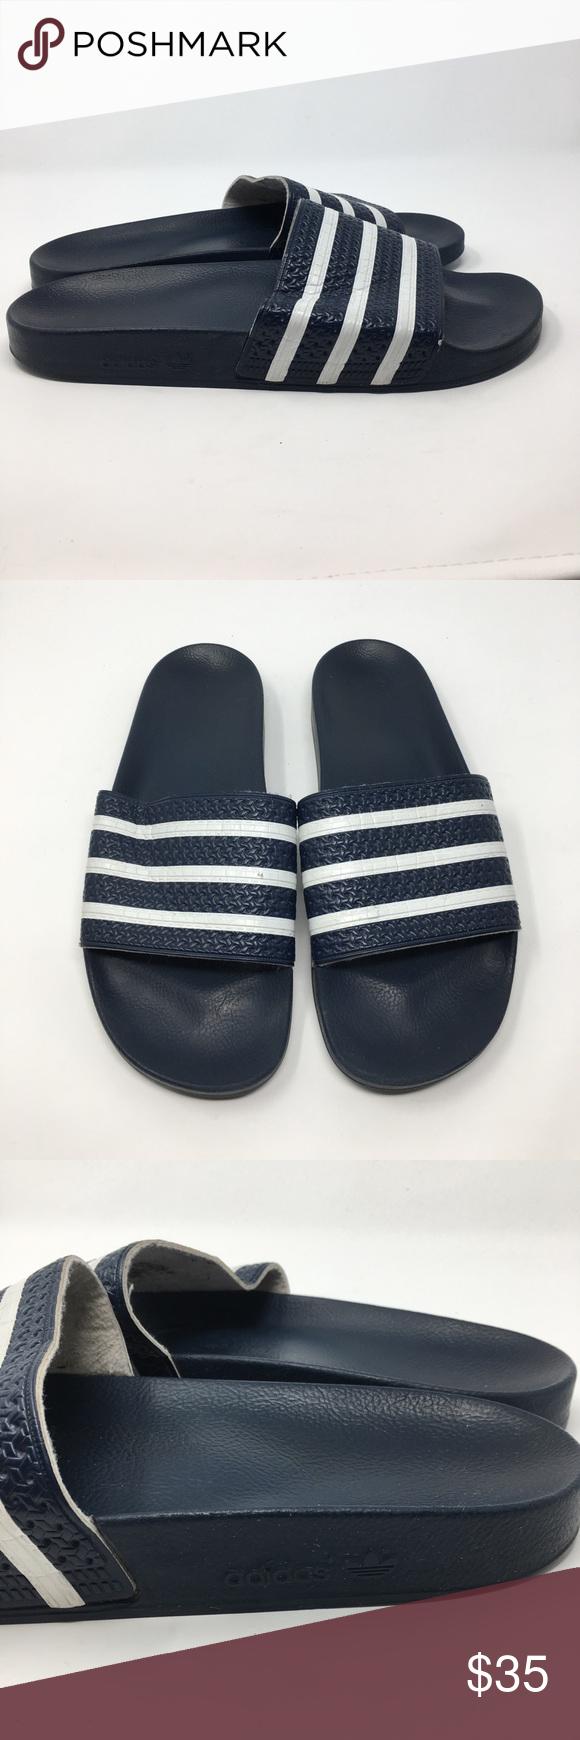 f7a6cdf07e8b78 Adidas Adilette Slides. Size 13 Adidas Adilette Slides. Navy. Men s size  13. Overall good condition! adidas Shoes Sandals   Flip-Flops